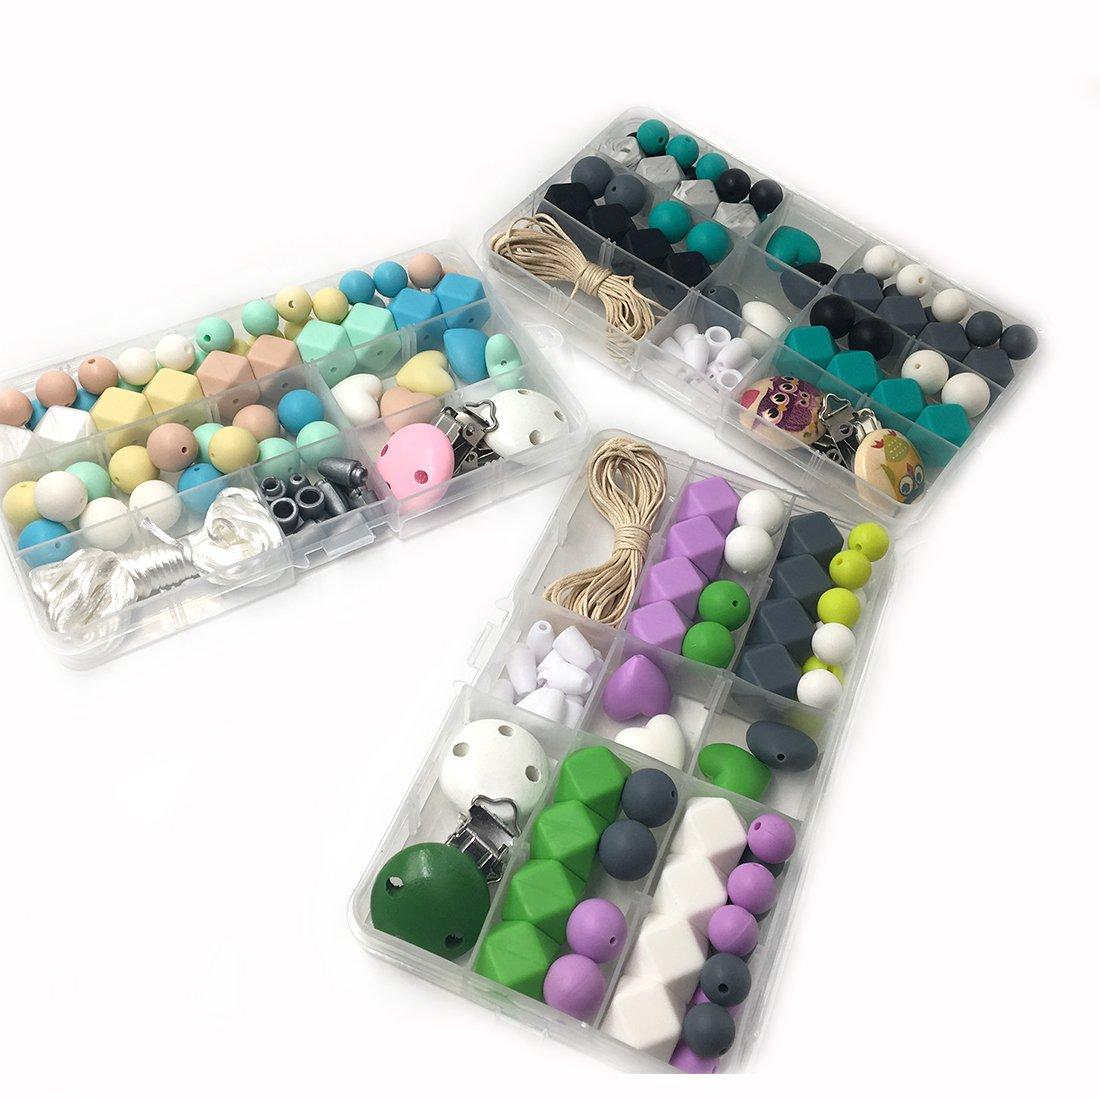 Coskiss DIY Krankenpflege Halskette Kit 3 Boxed Mixed Farbe Geometrie Hexagon Silikon Perlen Herz-Shaped Silikon